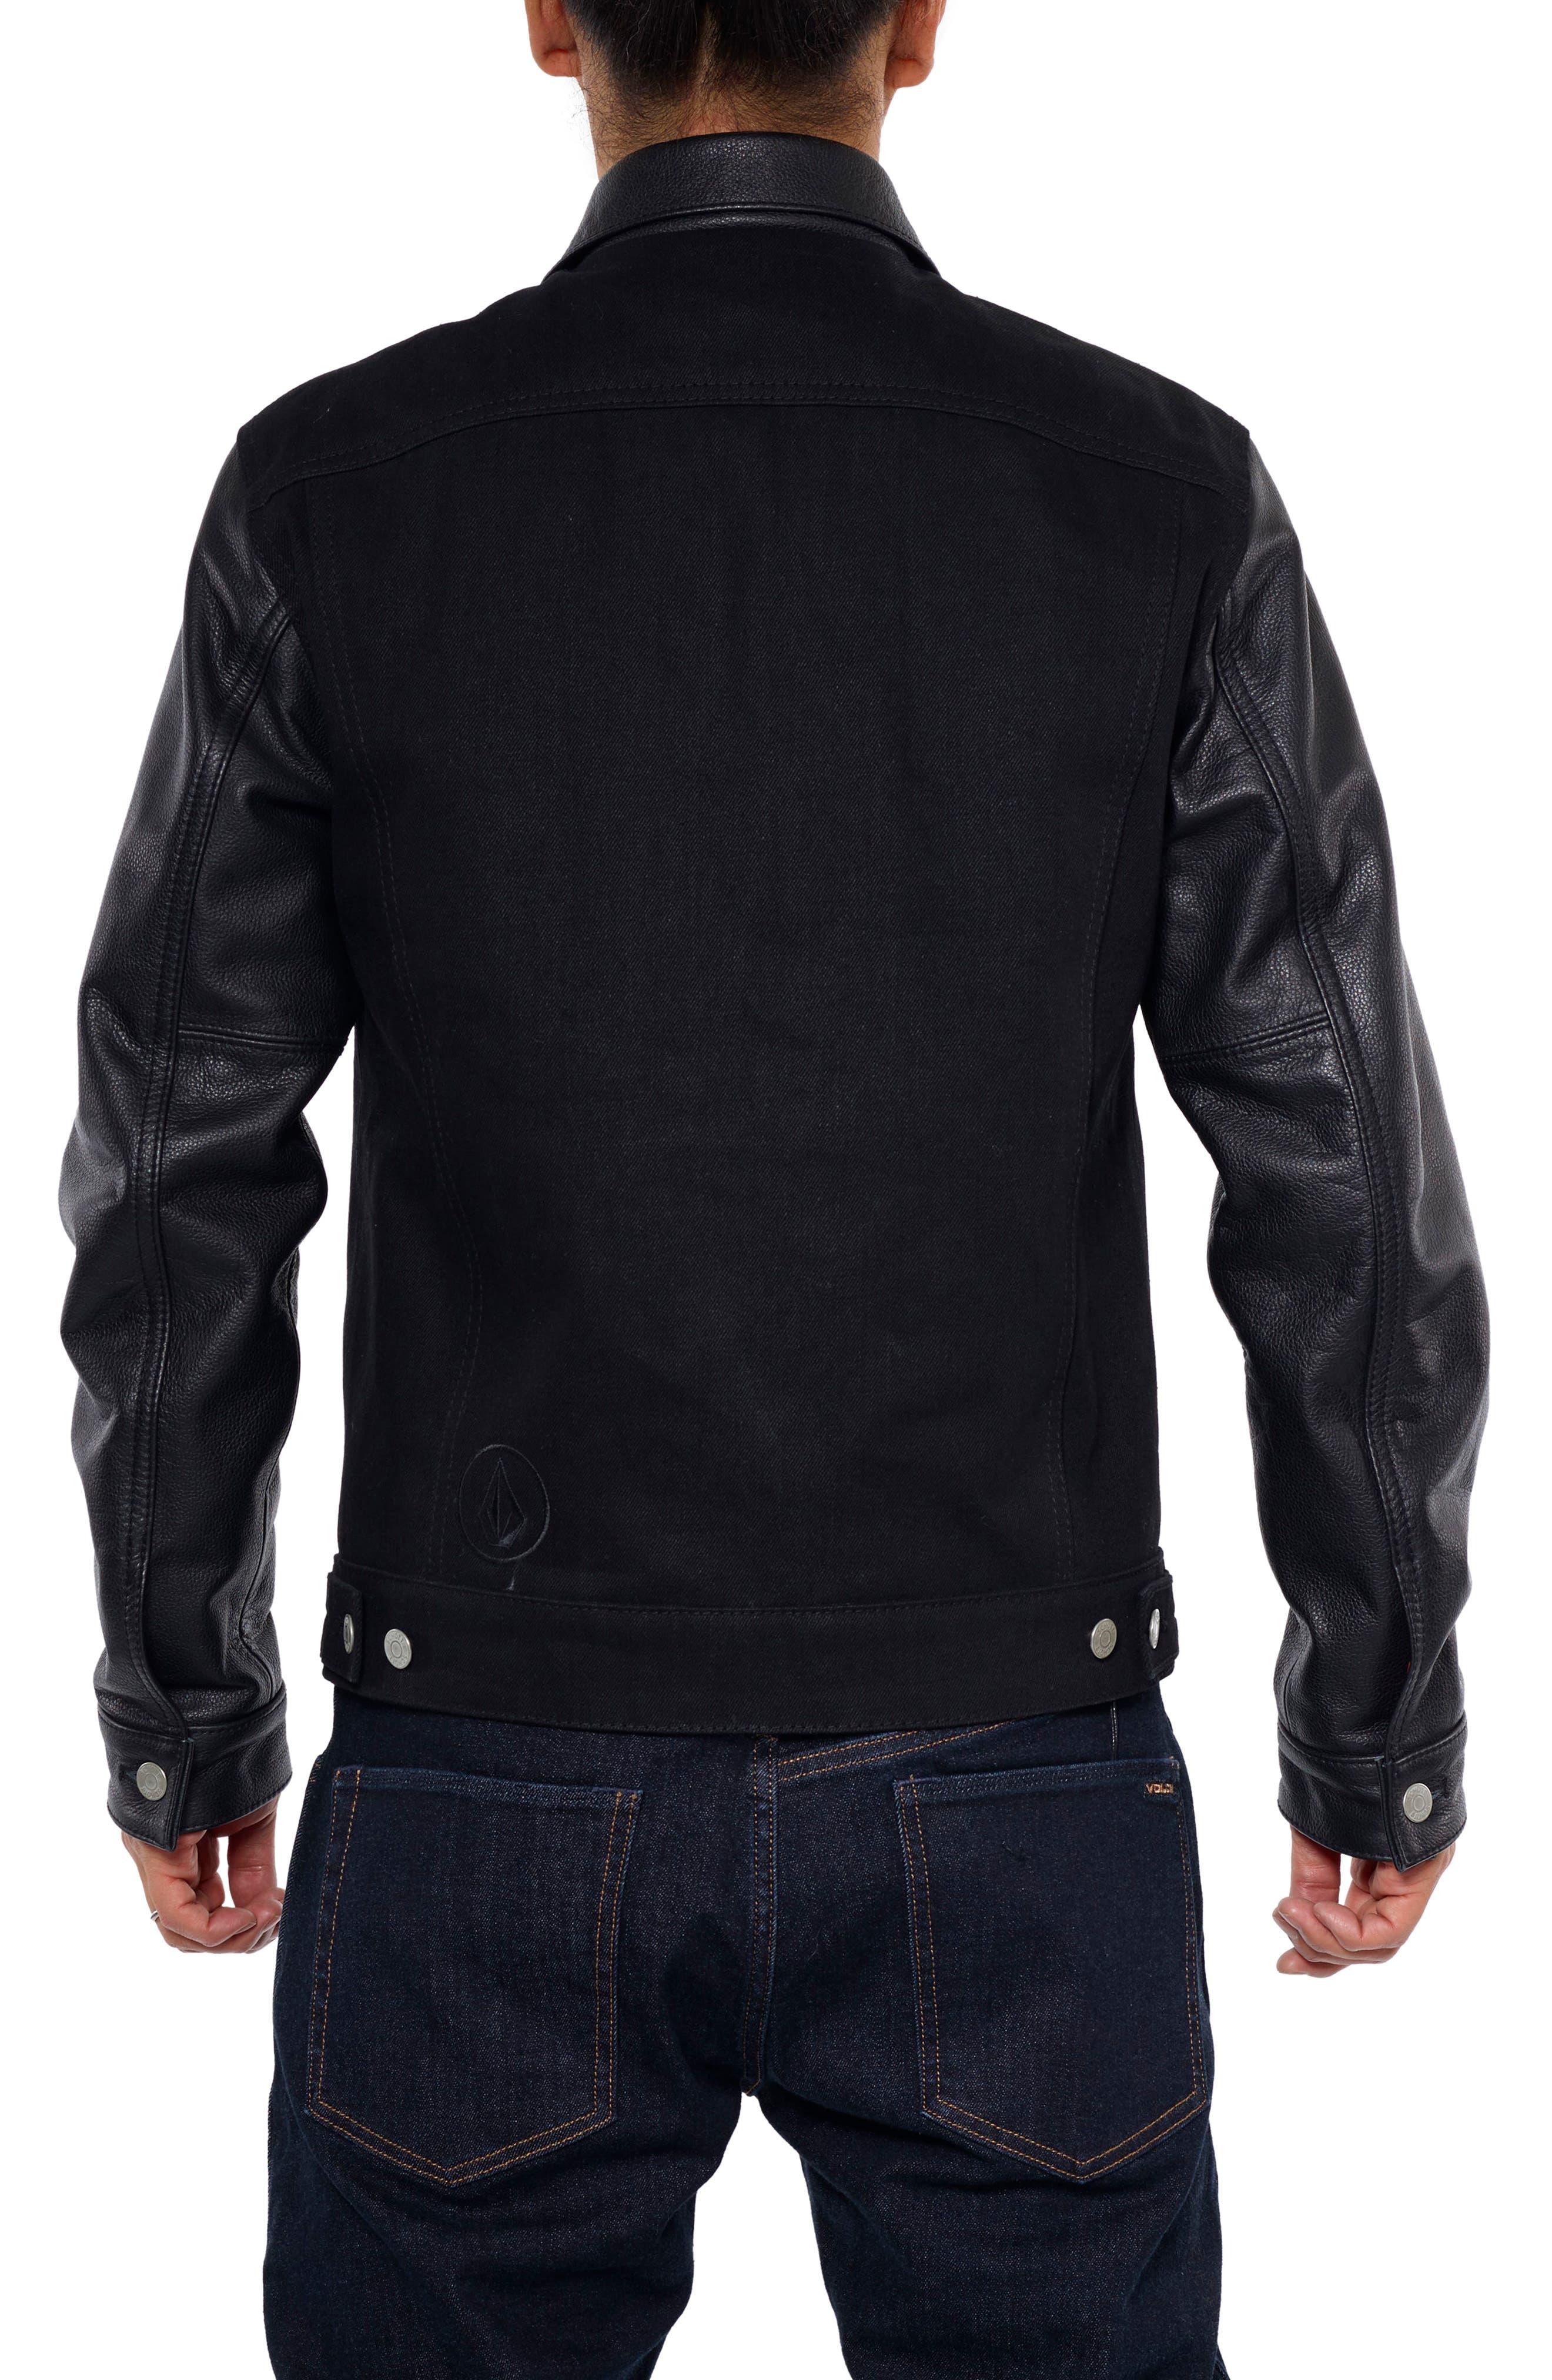 x Schott Denim Jacket,                             Alternate thumbnail 2, color,                             Black